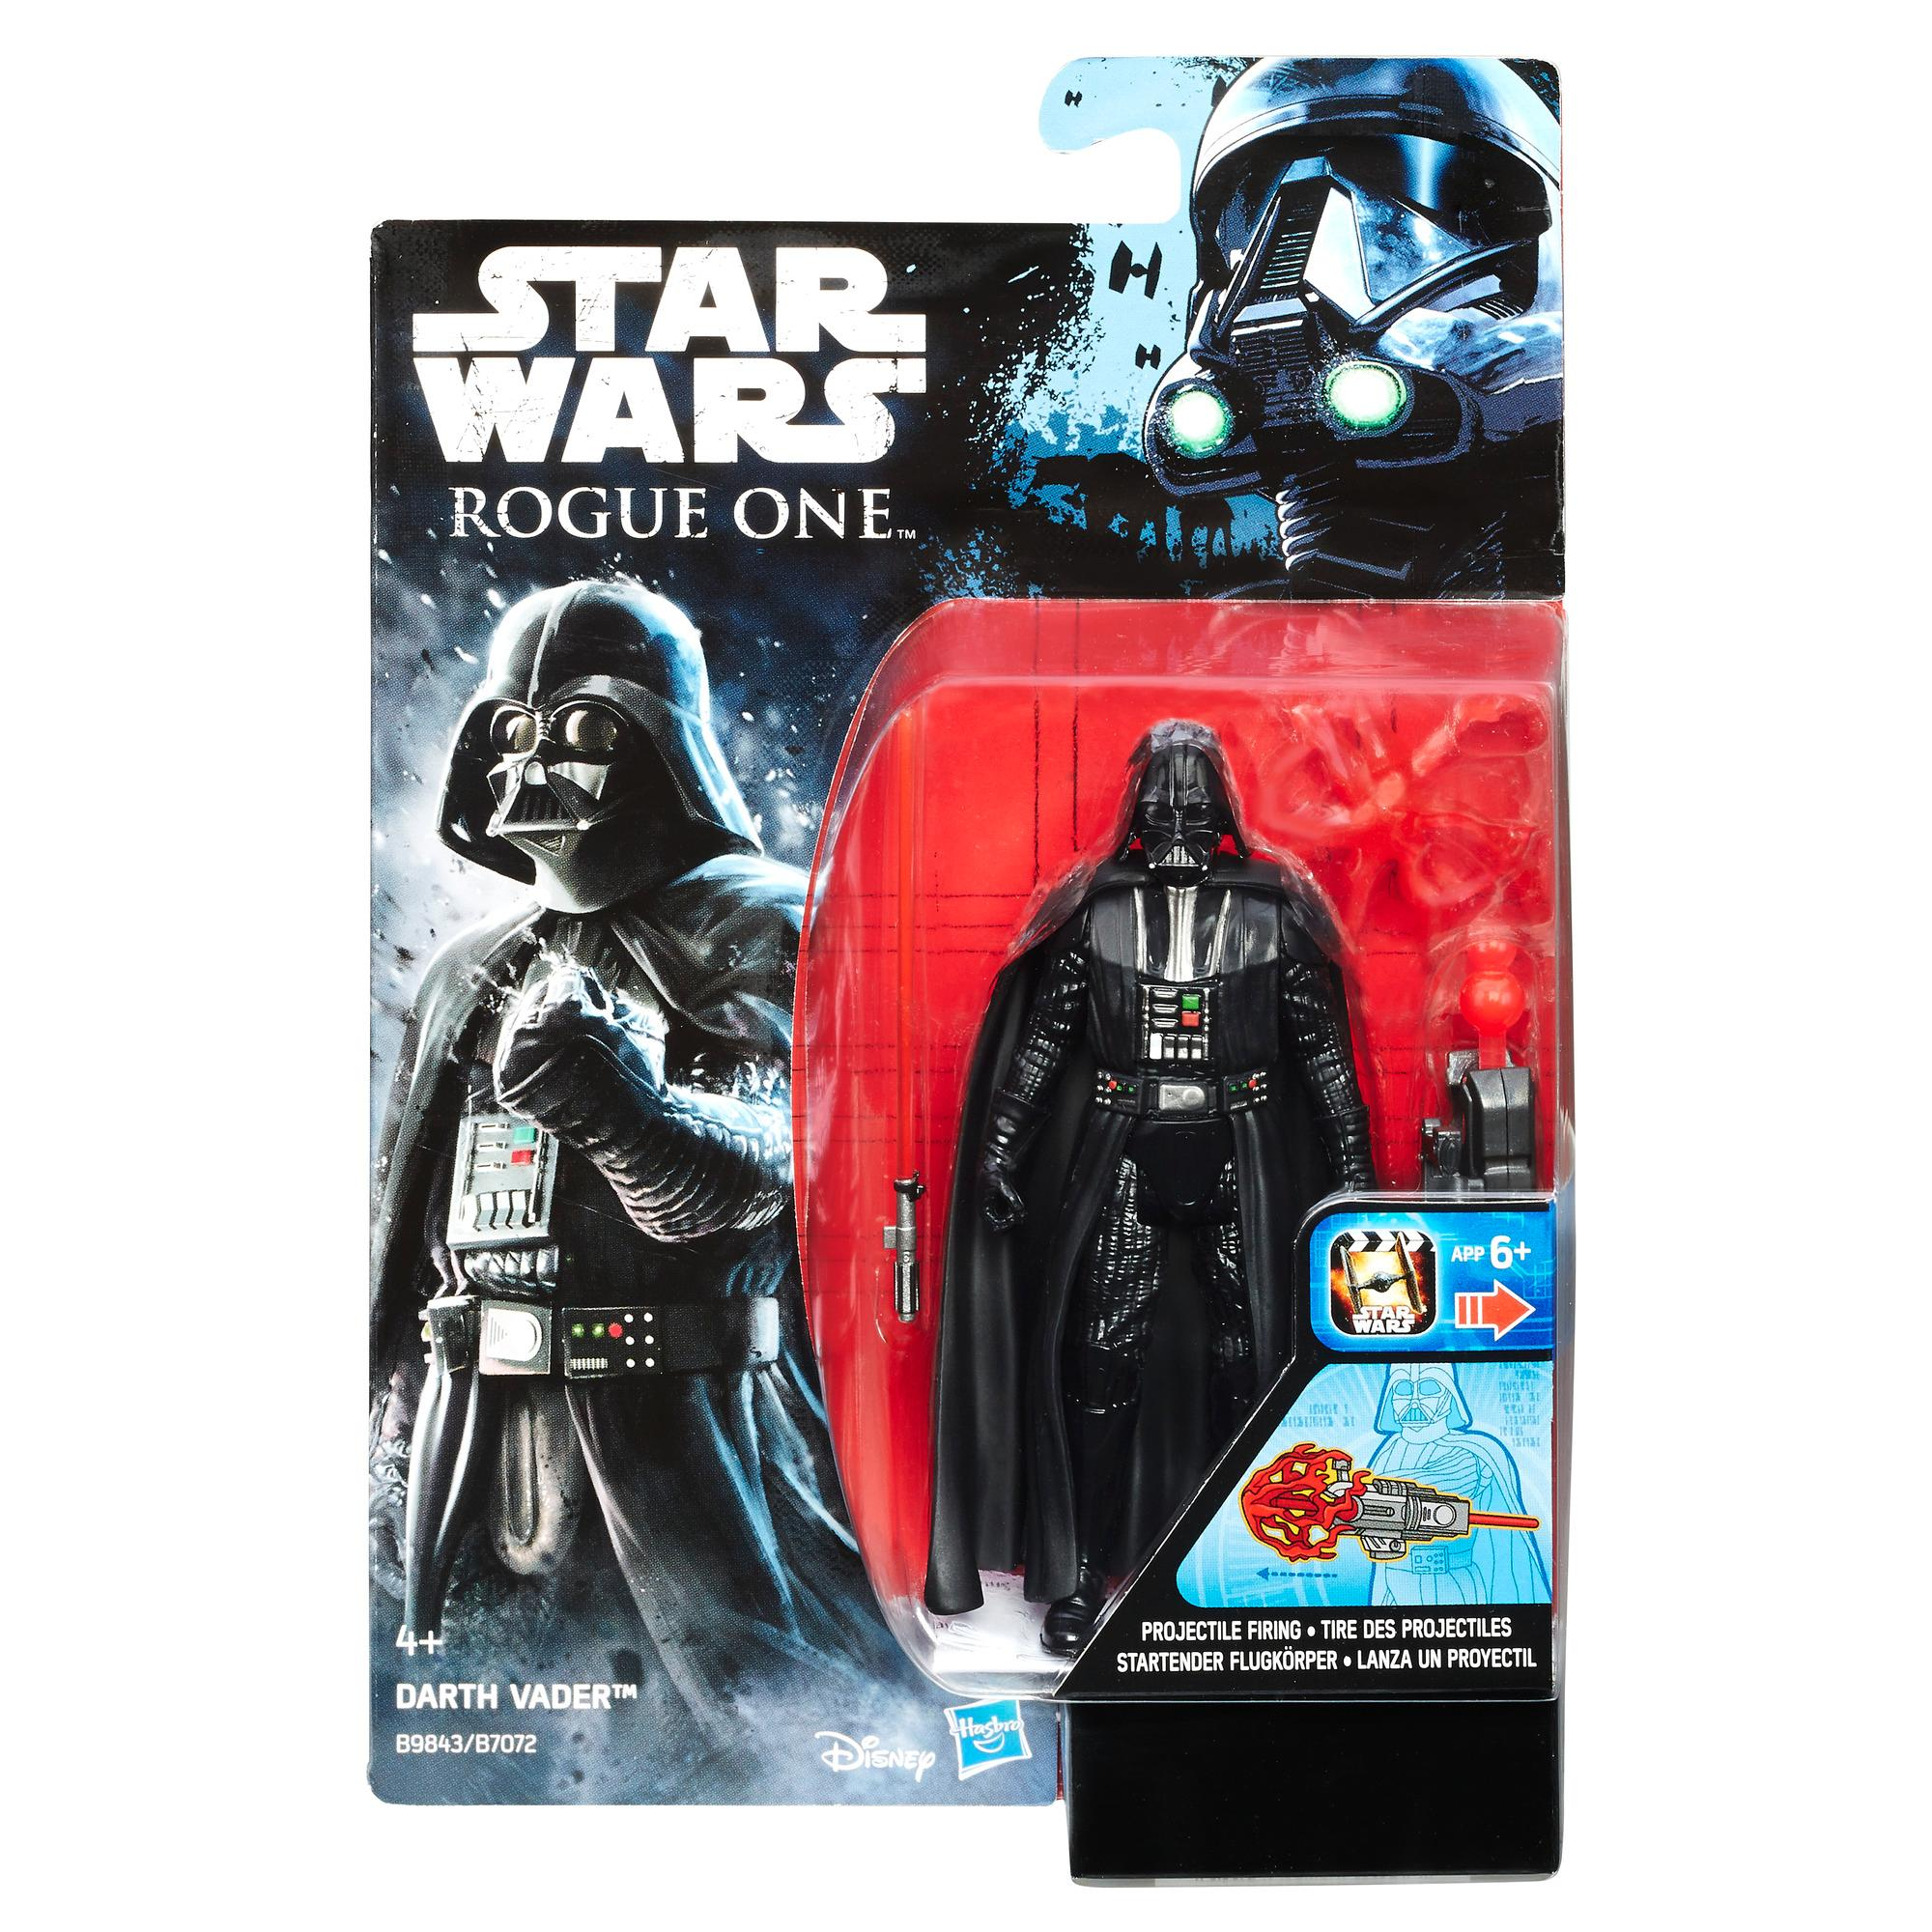 Star Wars Rogue One Darth Vader Figure